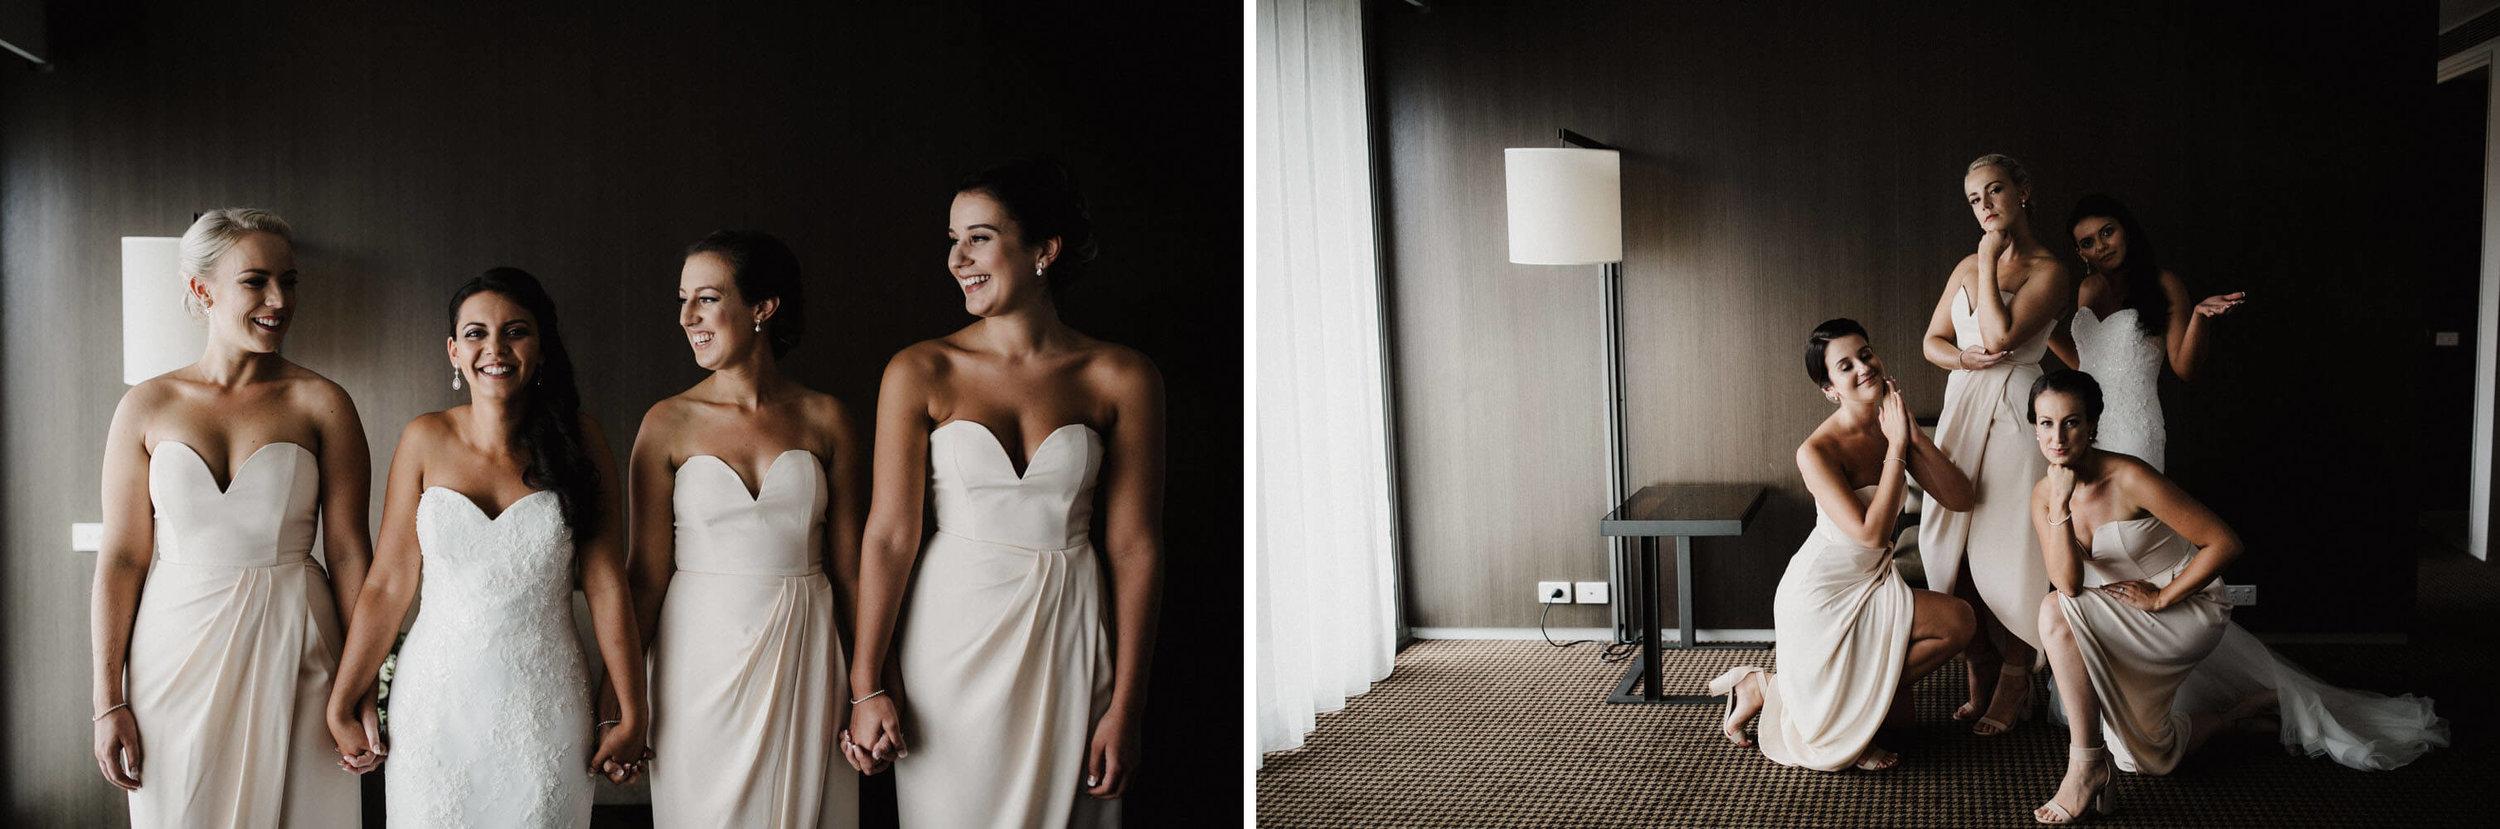 wedding-national-gallery-australia-22(8309)2.jpg